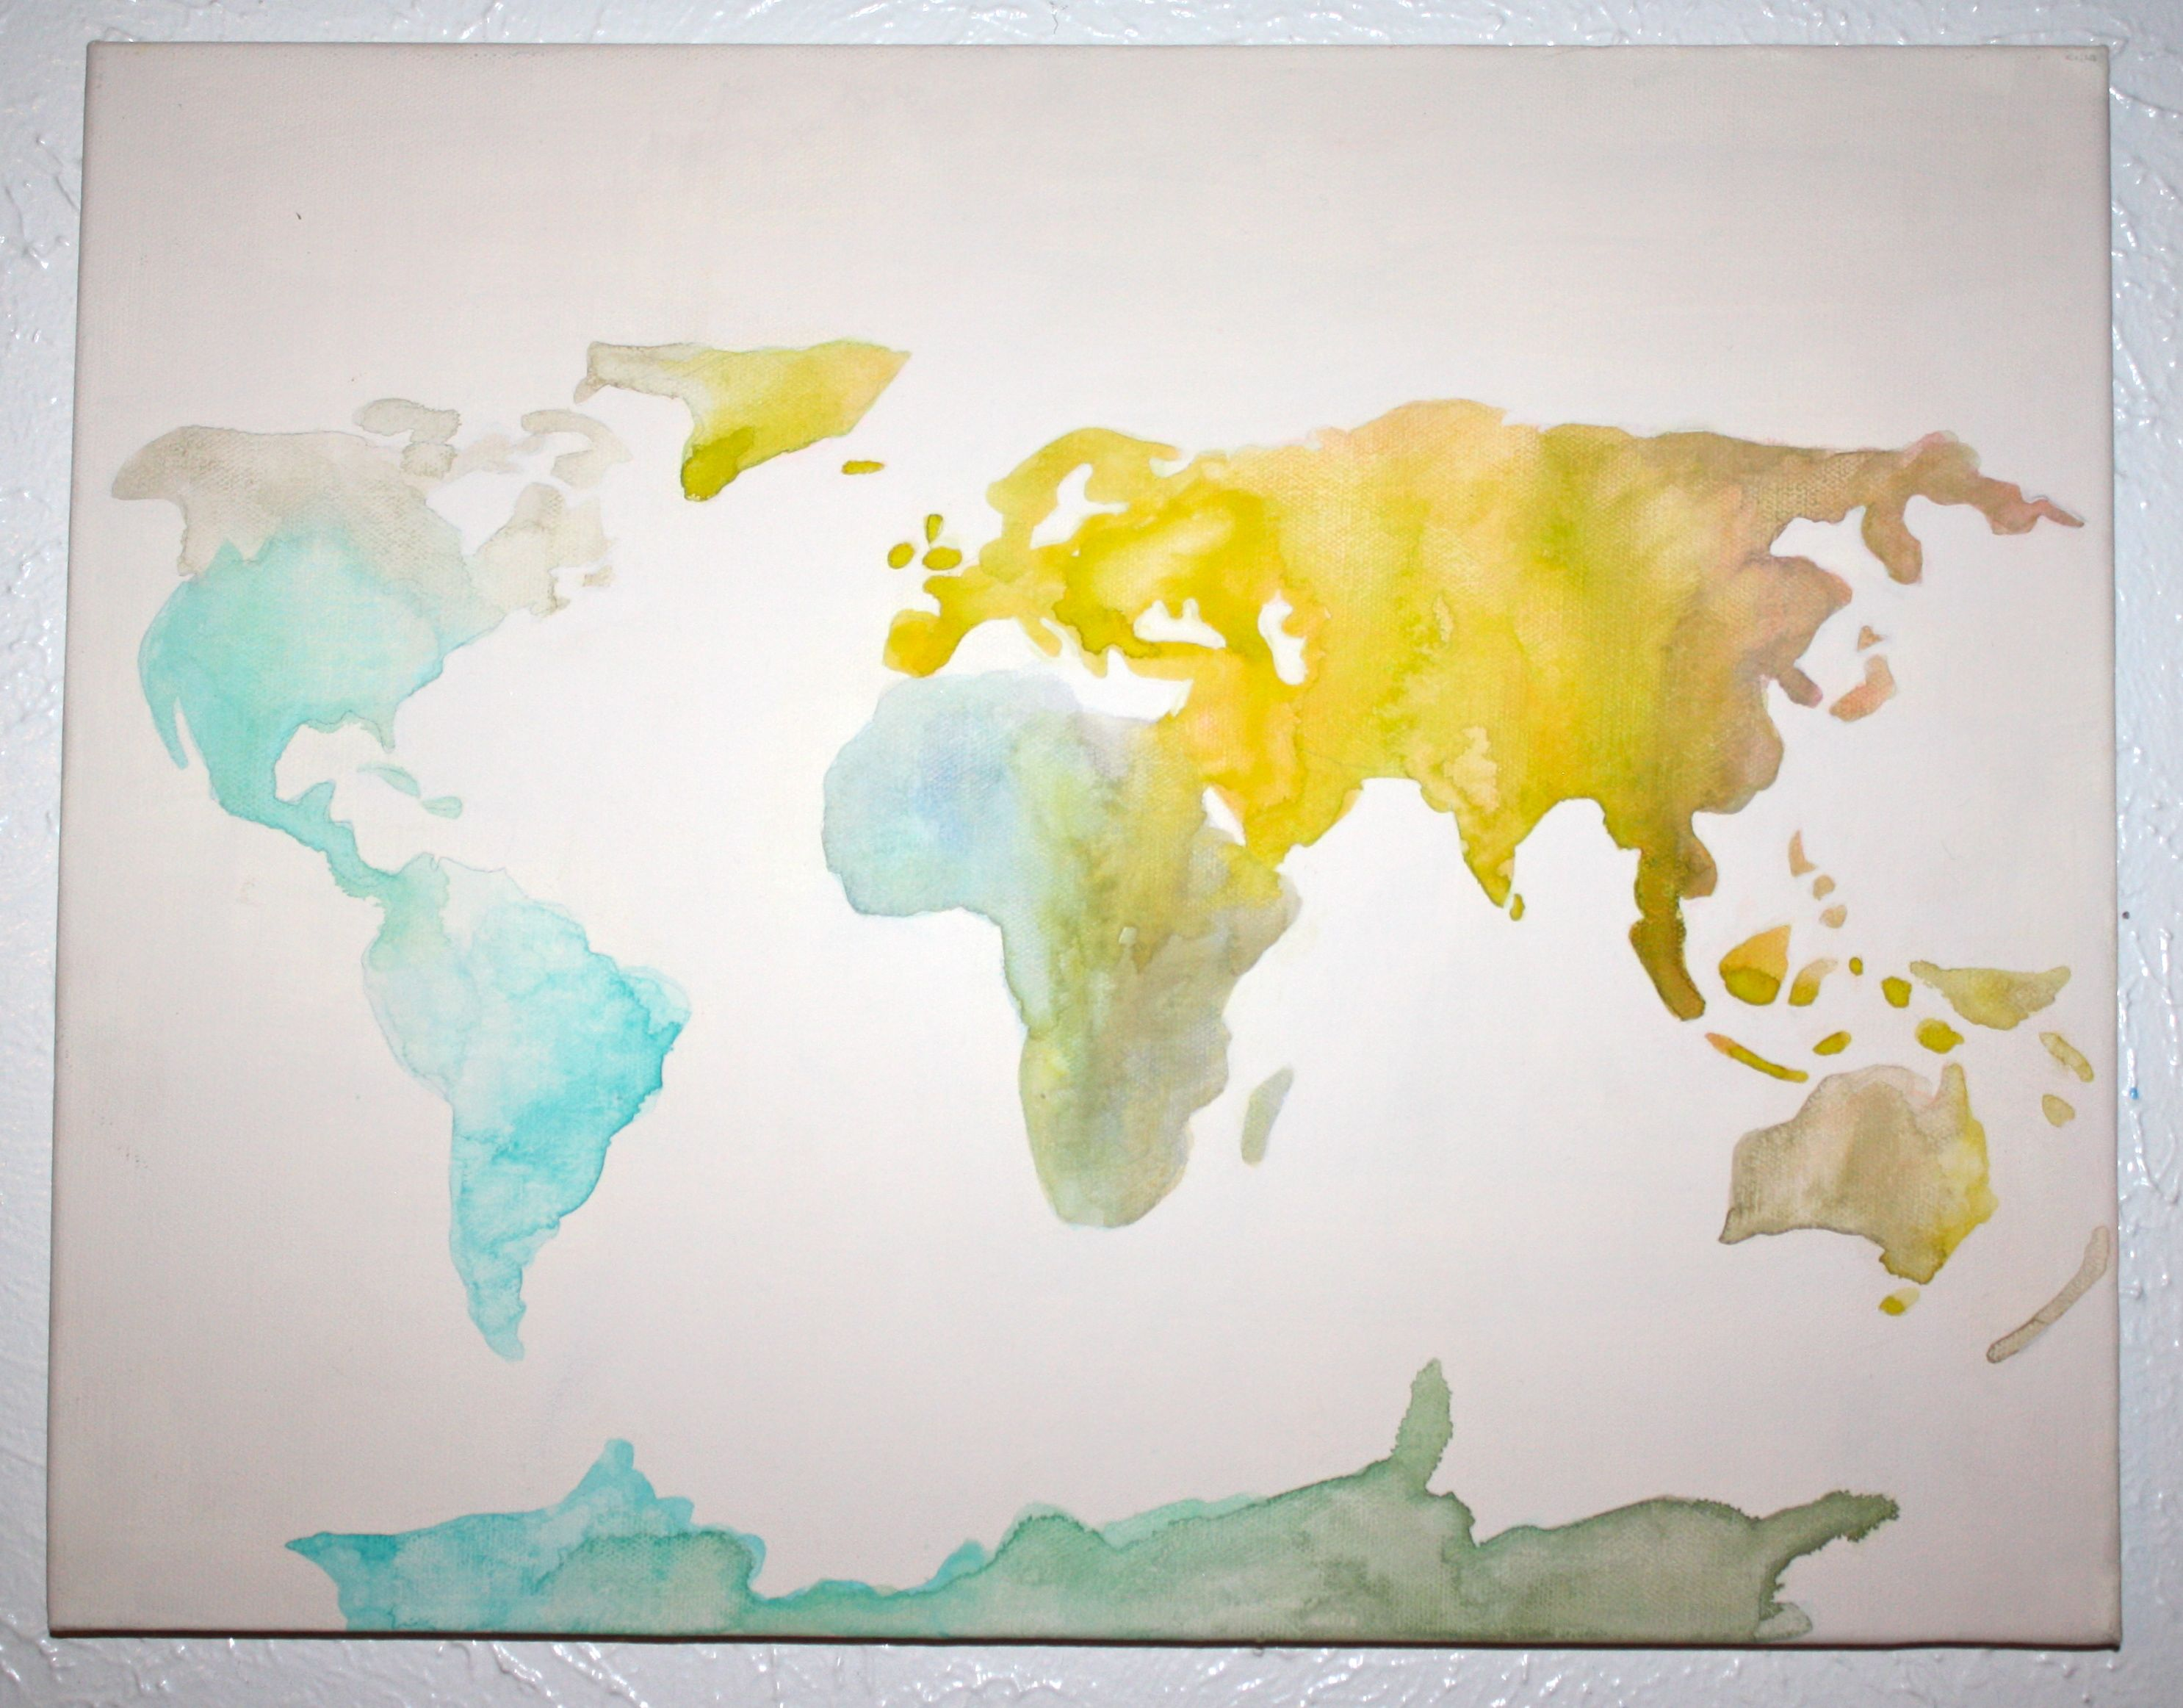 watercolor world map | DIY | Pinterest | Watercolor, Gallery wall ...